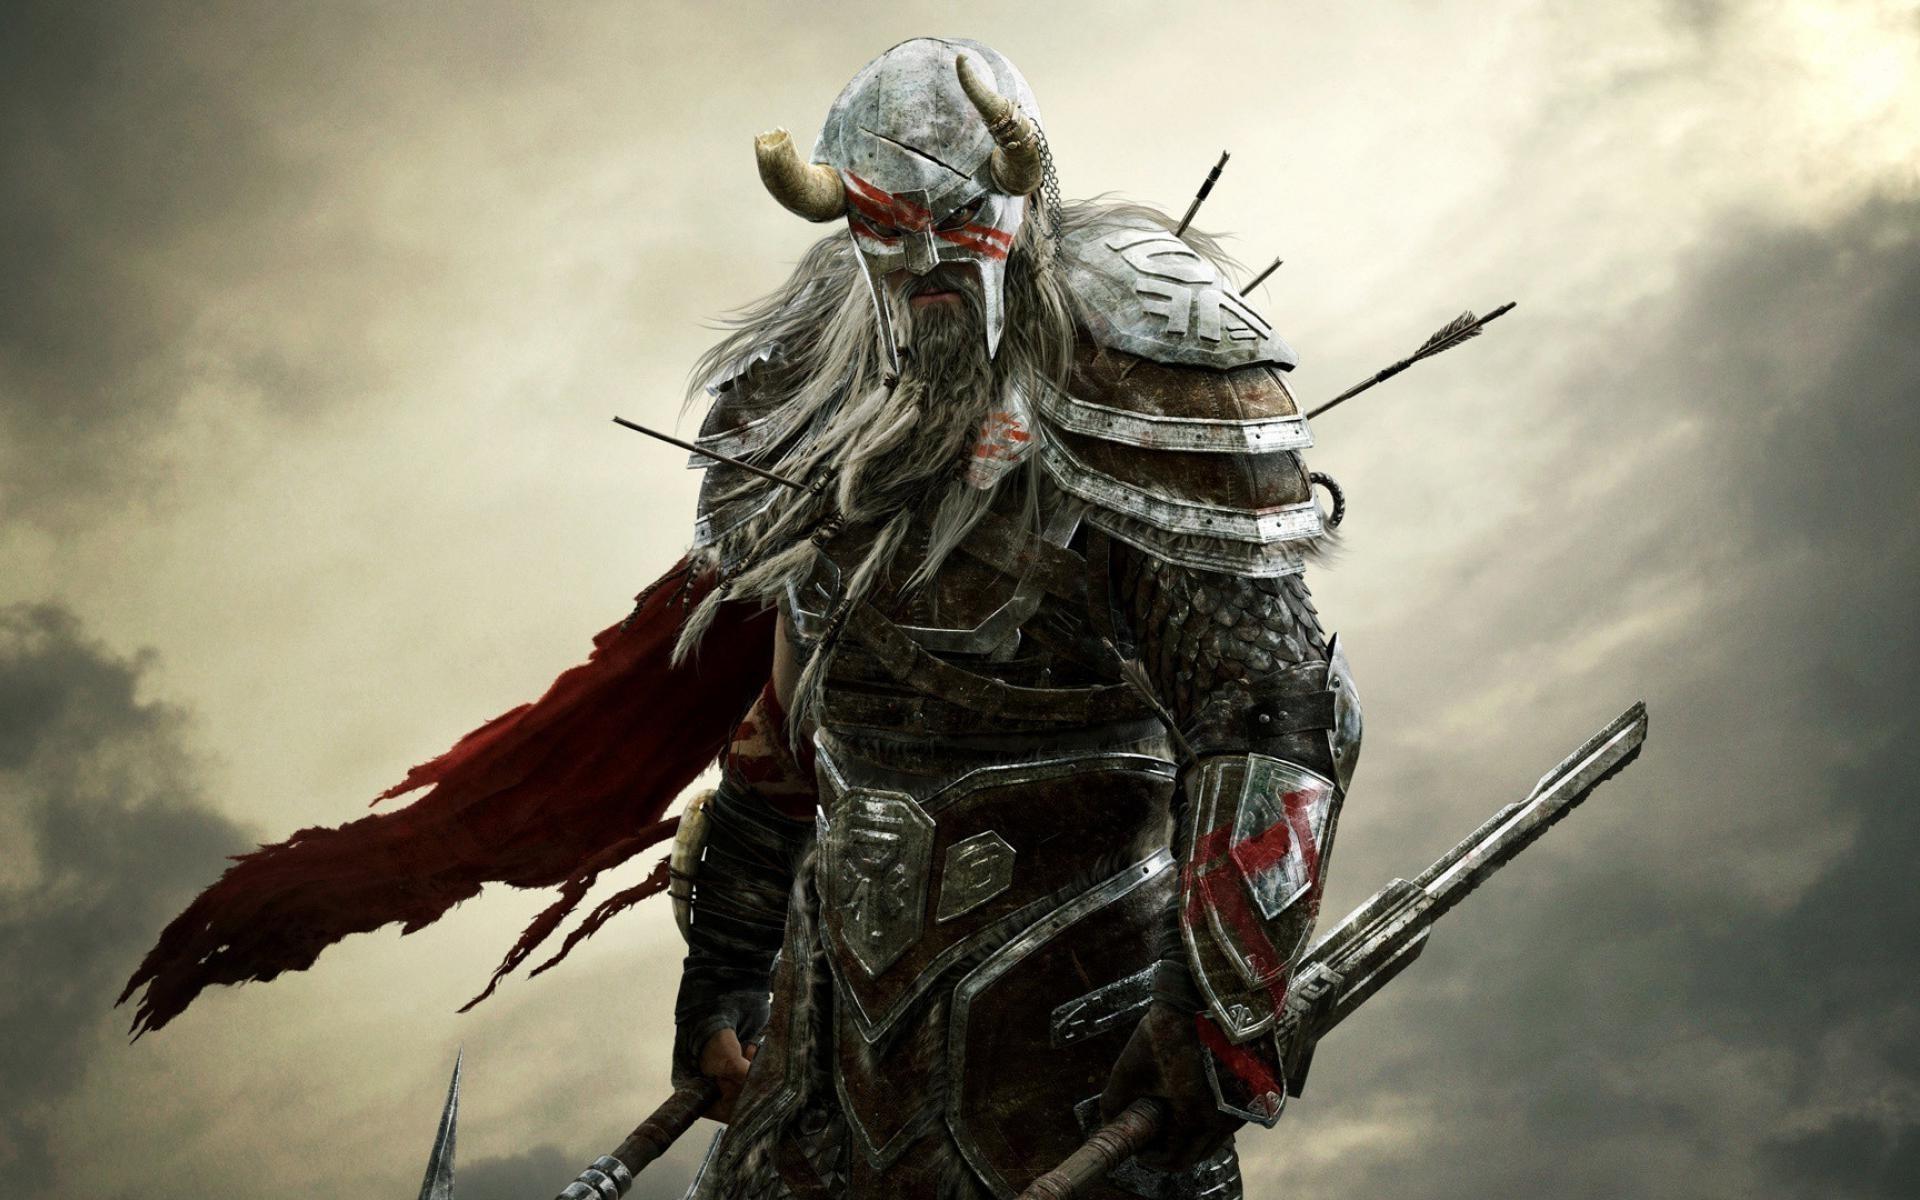 video Games, The Elder Scrolls Online, The Elder Scrolls, Fantasy Art, Warrior  Wallpapers HD / Desktop and Mobile Backgrounds